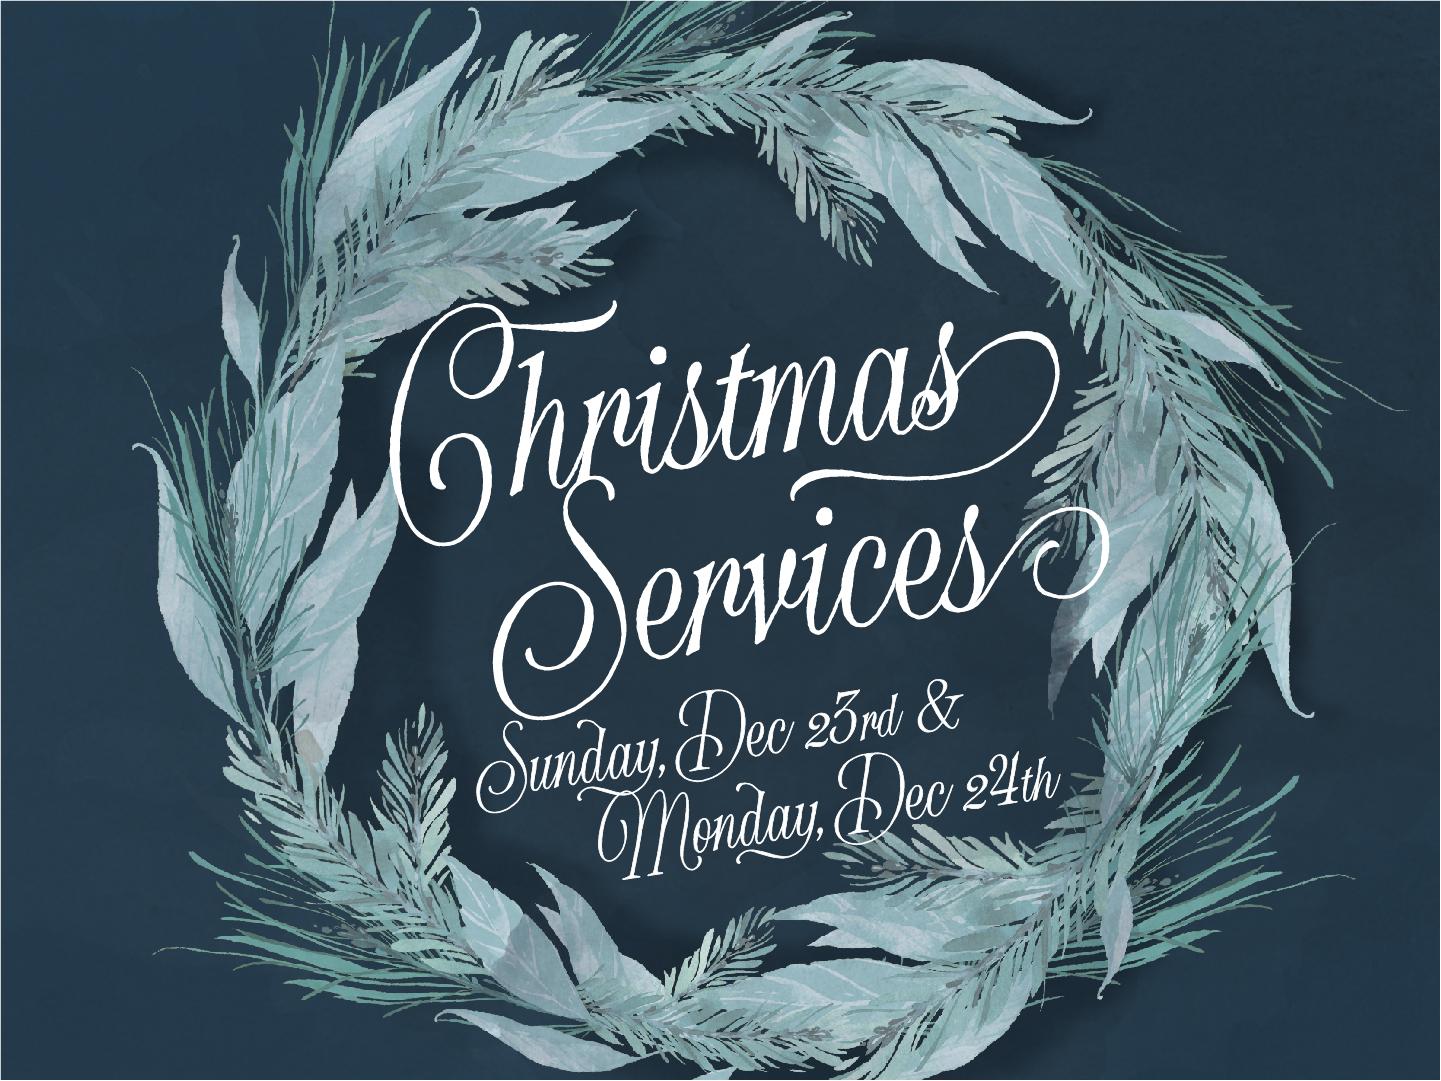 LMCC_Christmas_Art_Large_Event.jpg